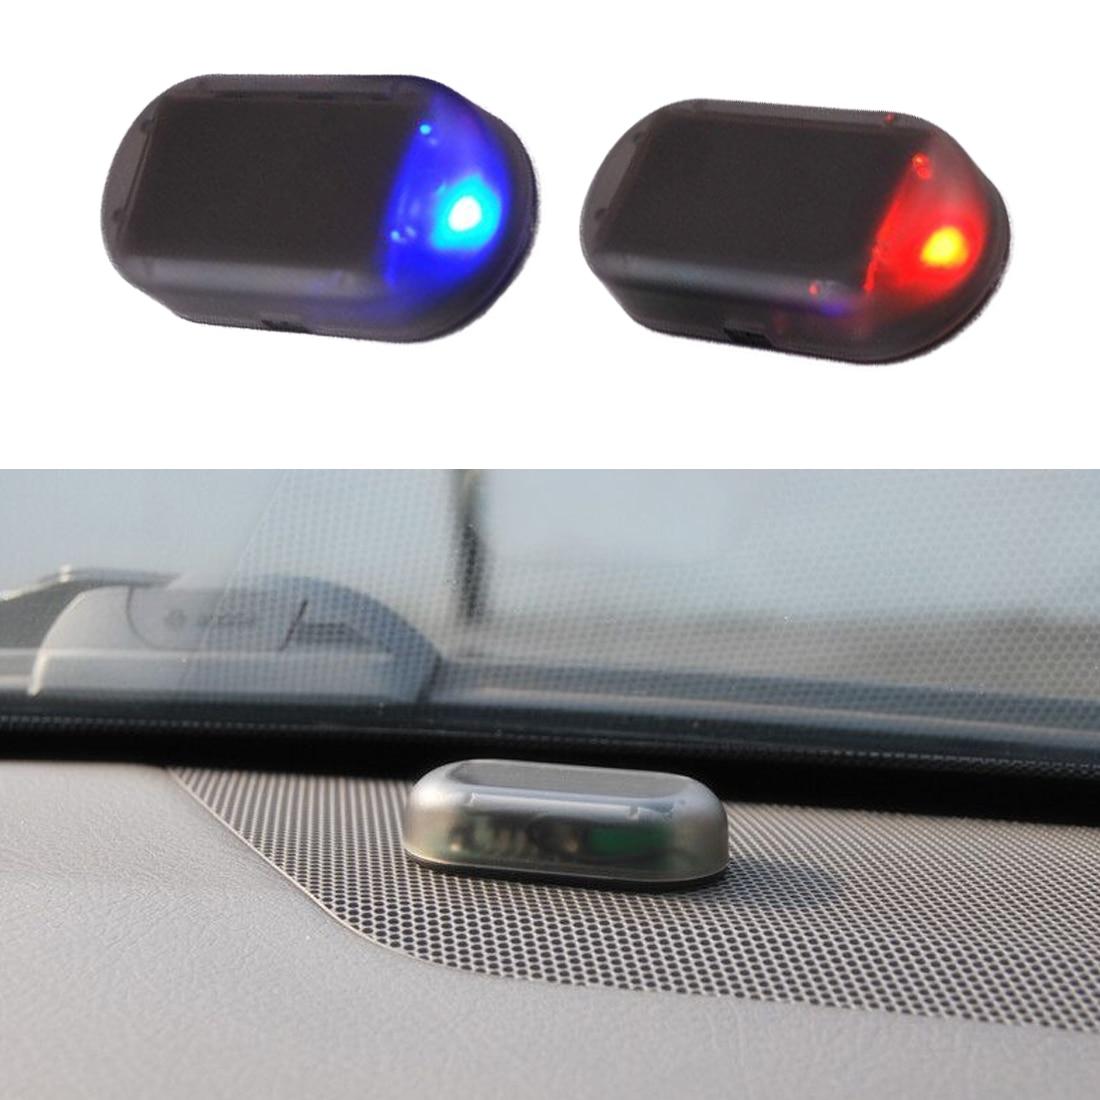 Tonewan 1PCS Universal Security System Warning Theft Flash Blinking Fake Solar Car